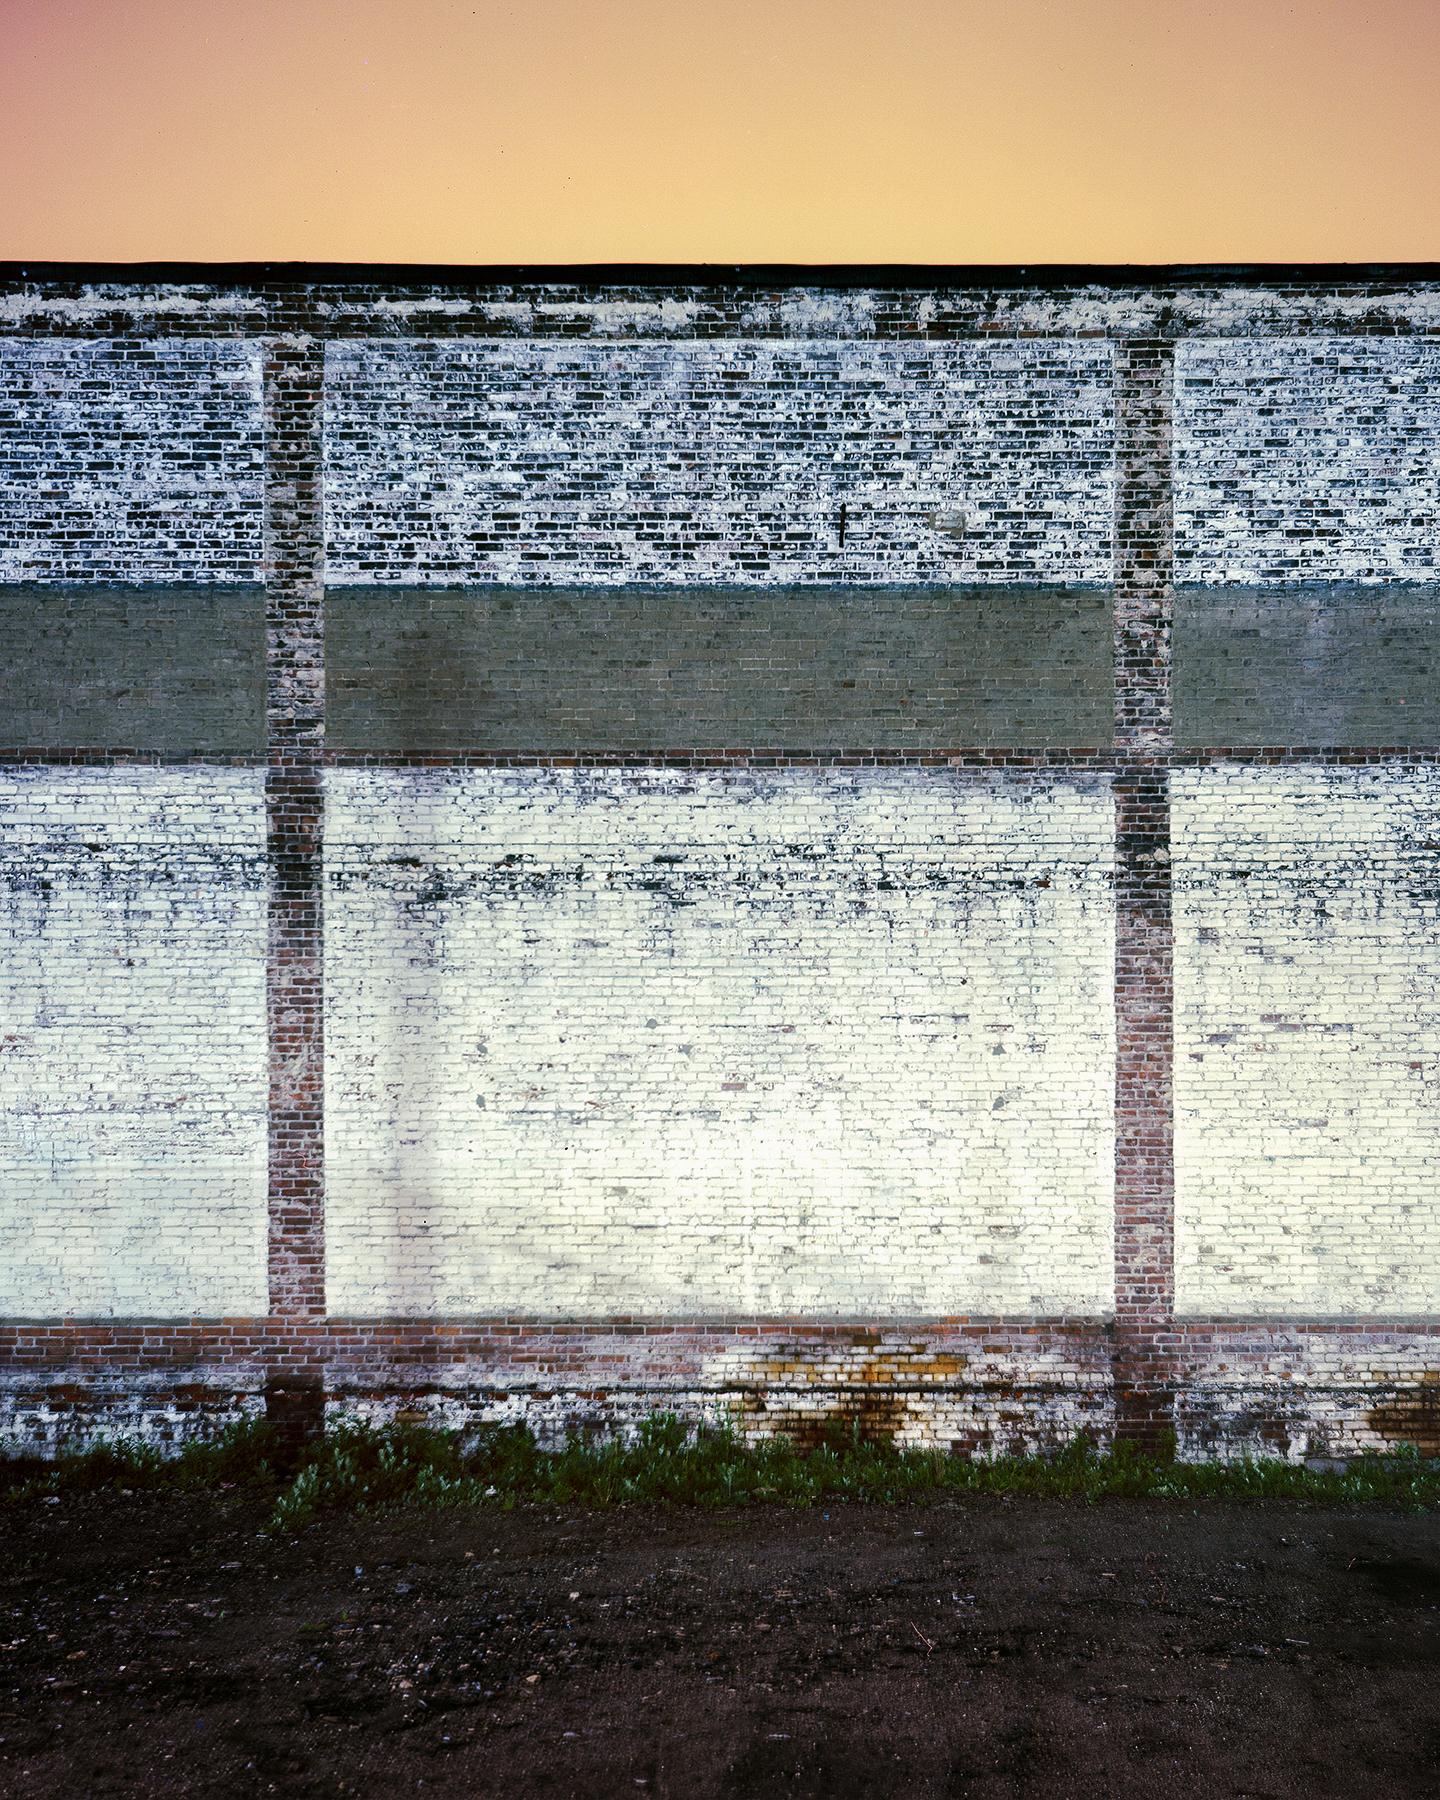 Brick_and_glass-Paul_Puiia-11.jpg